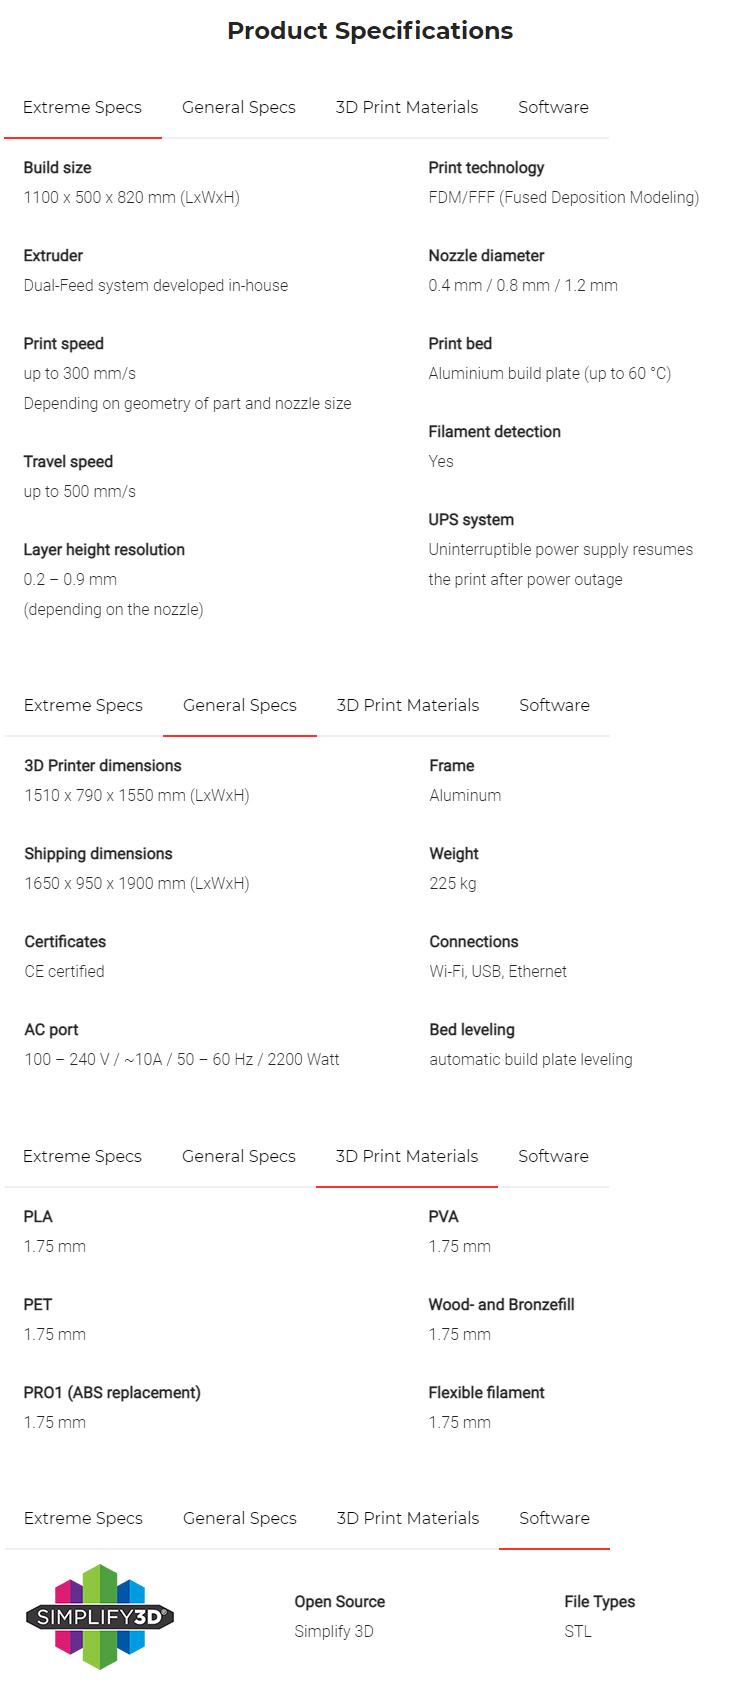 Builder_Extreme_1500_Pro_specs.jpg